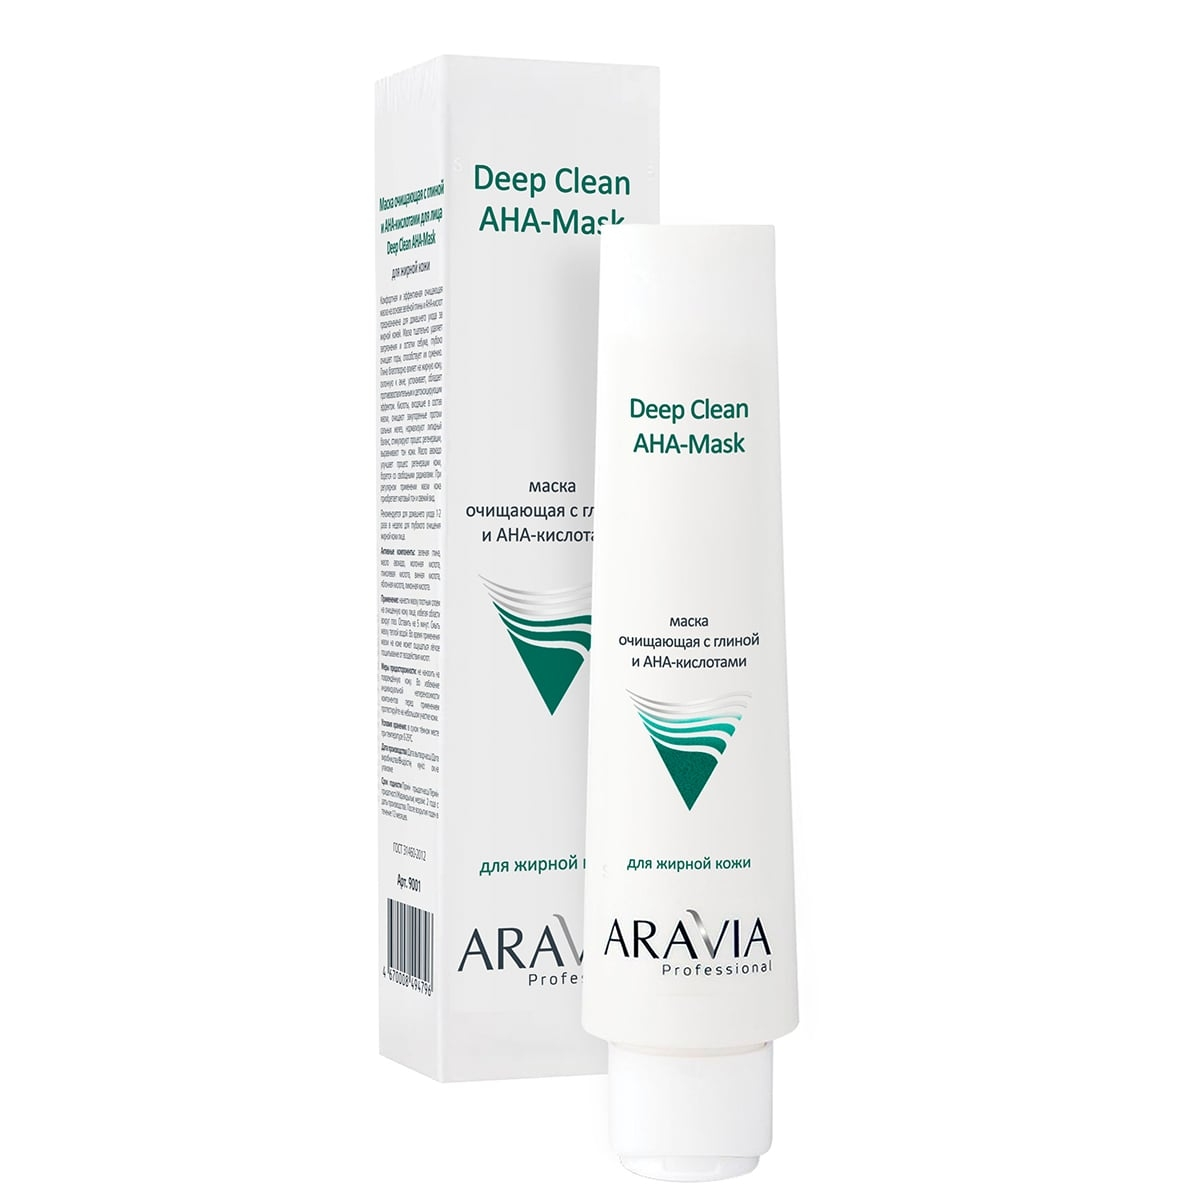 ARAVIA Маска Очищающая с Глиной и AHA-Кислотами для Лица Deep Clean AHA-Mask, 100 мл